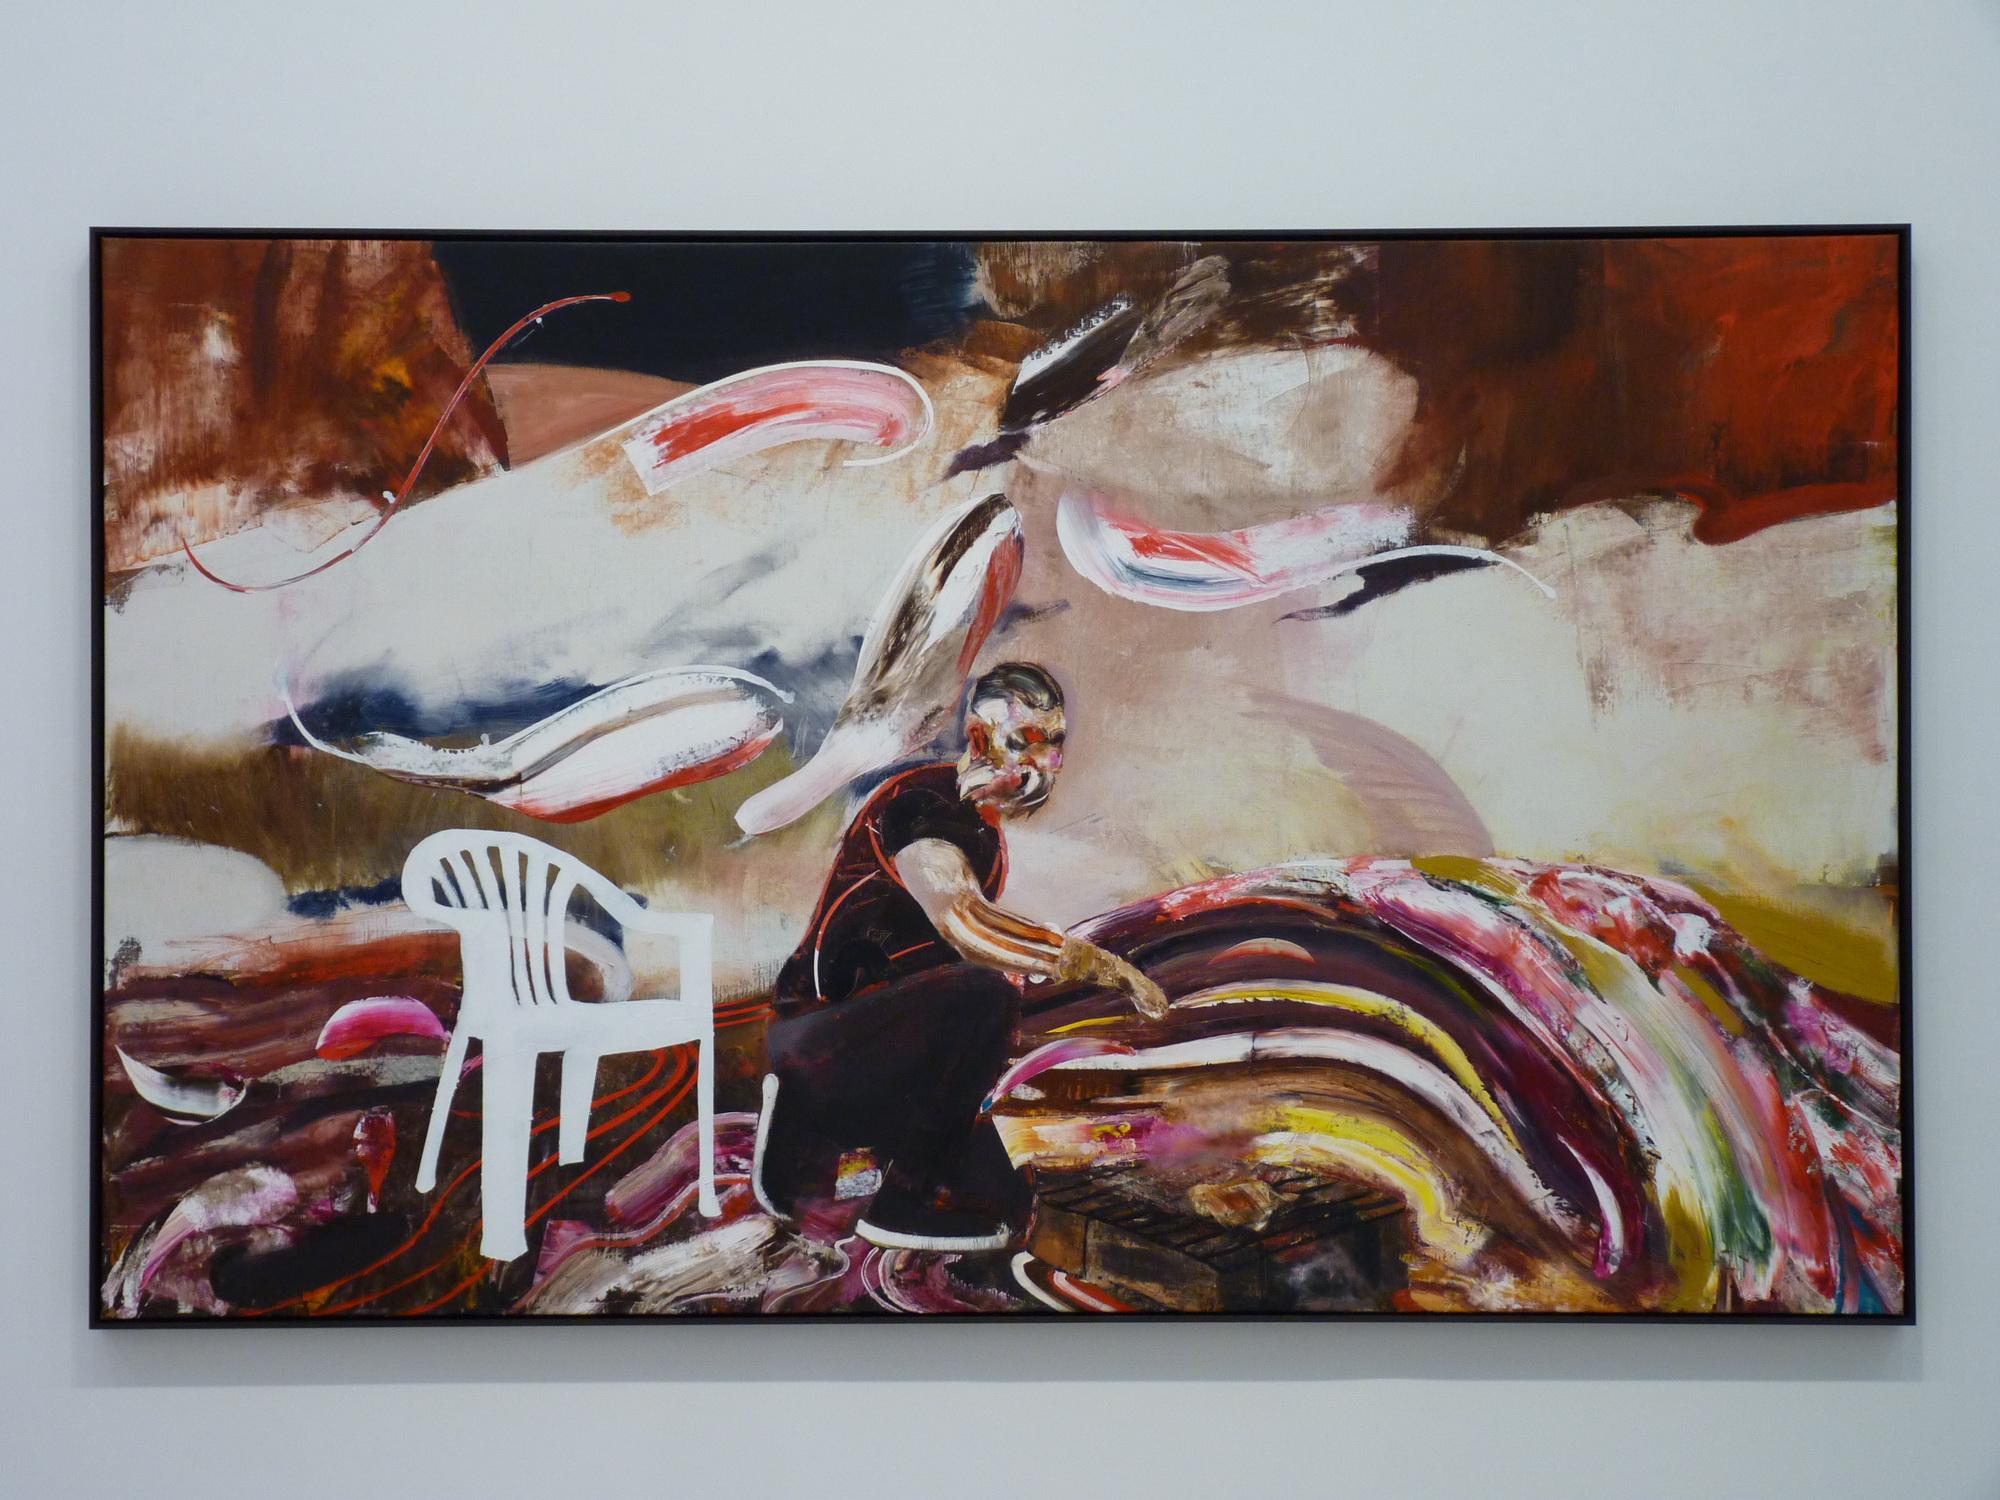 019-3  Adrian Ghenie  ne1977  self-portrait  230x160cm 2015 huile sur toile